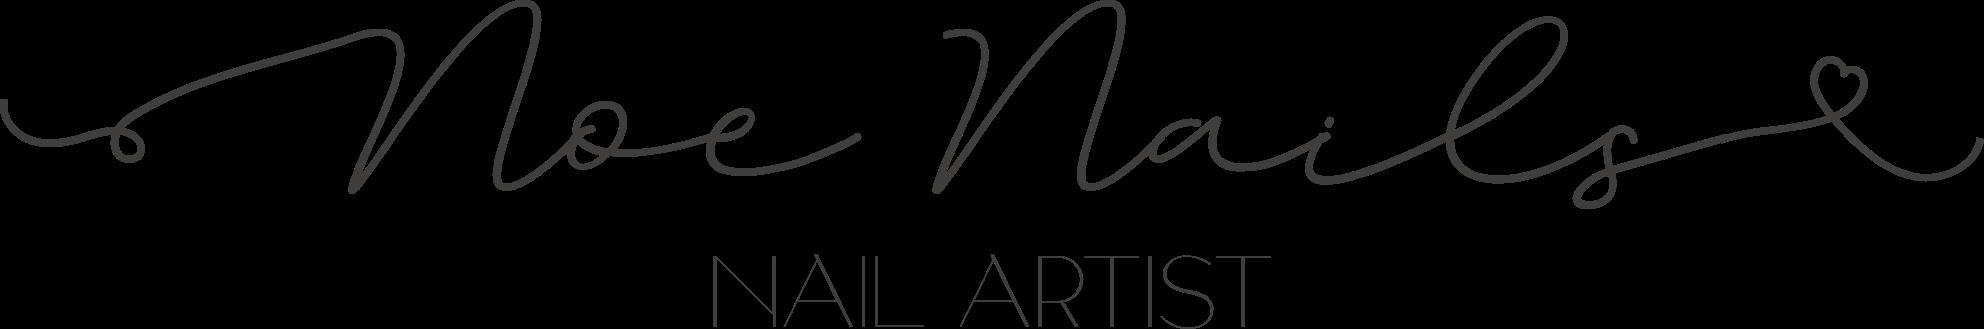 NoeNails Logo